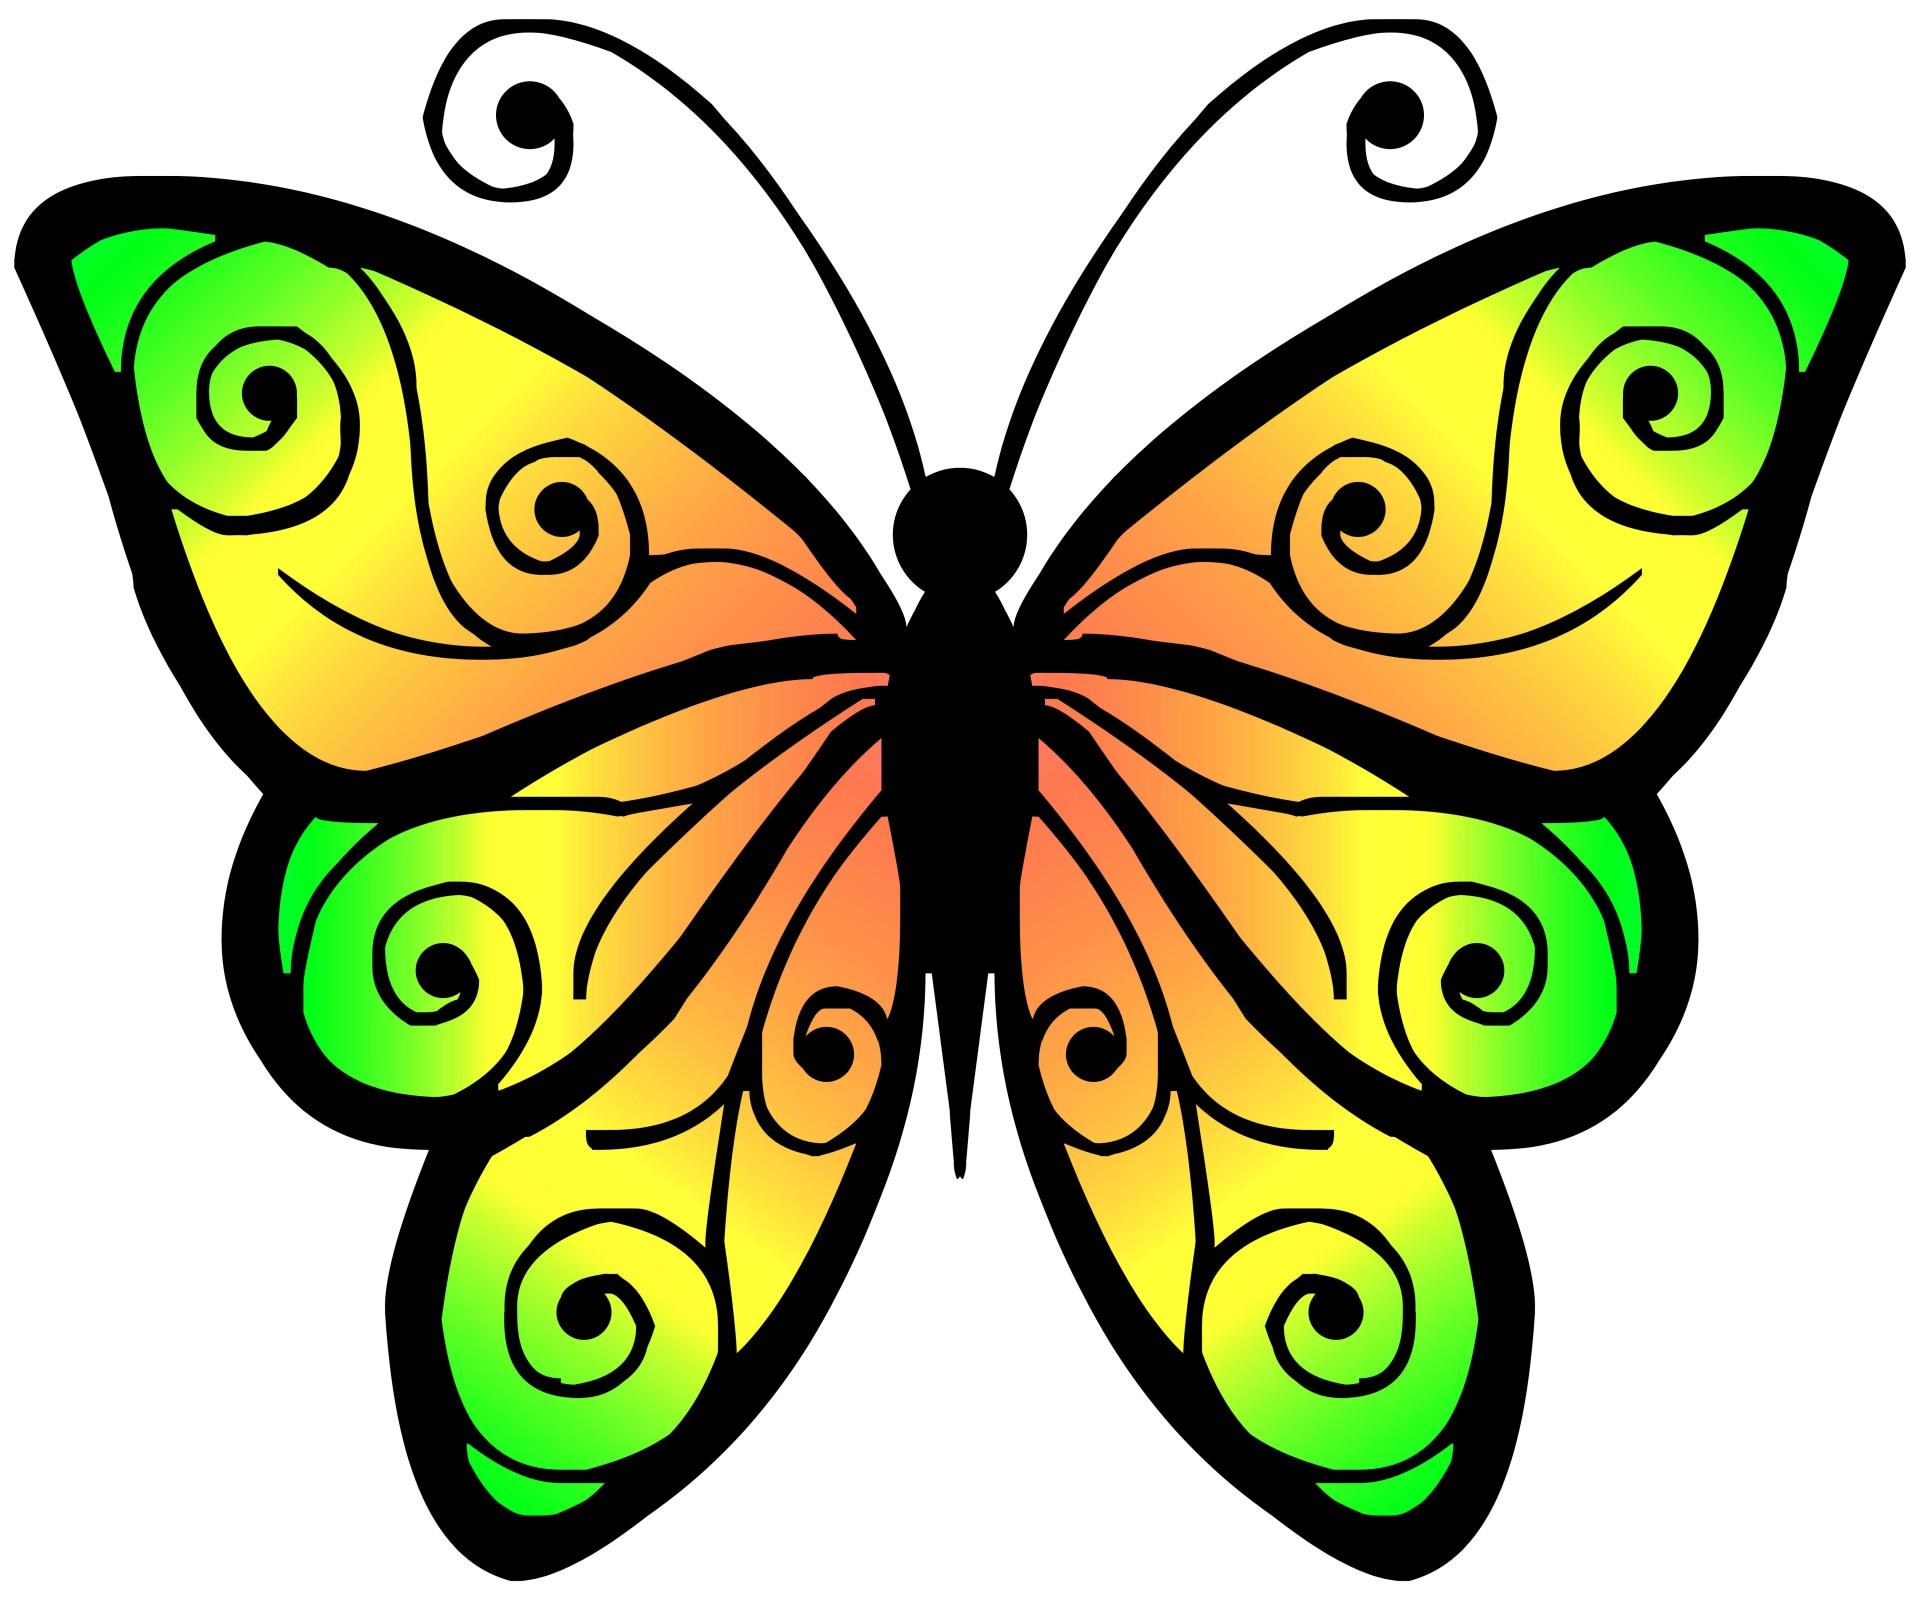 Clipart Schmetterling 4 Kostenloses Stock Bild.